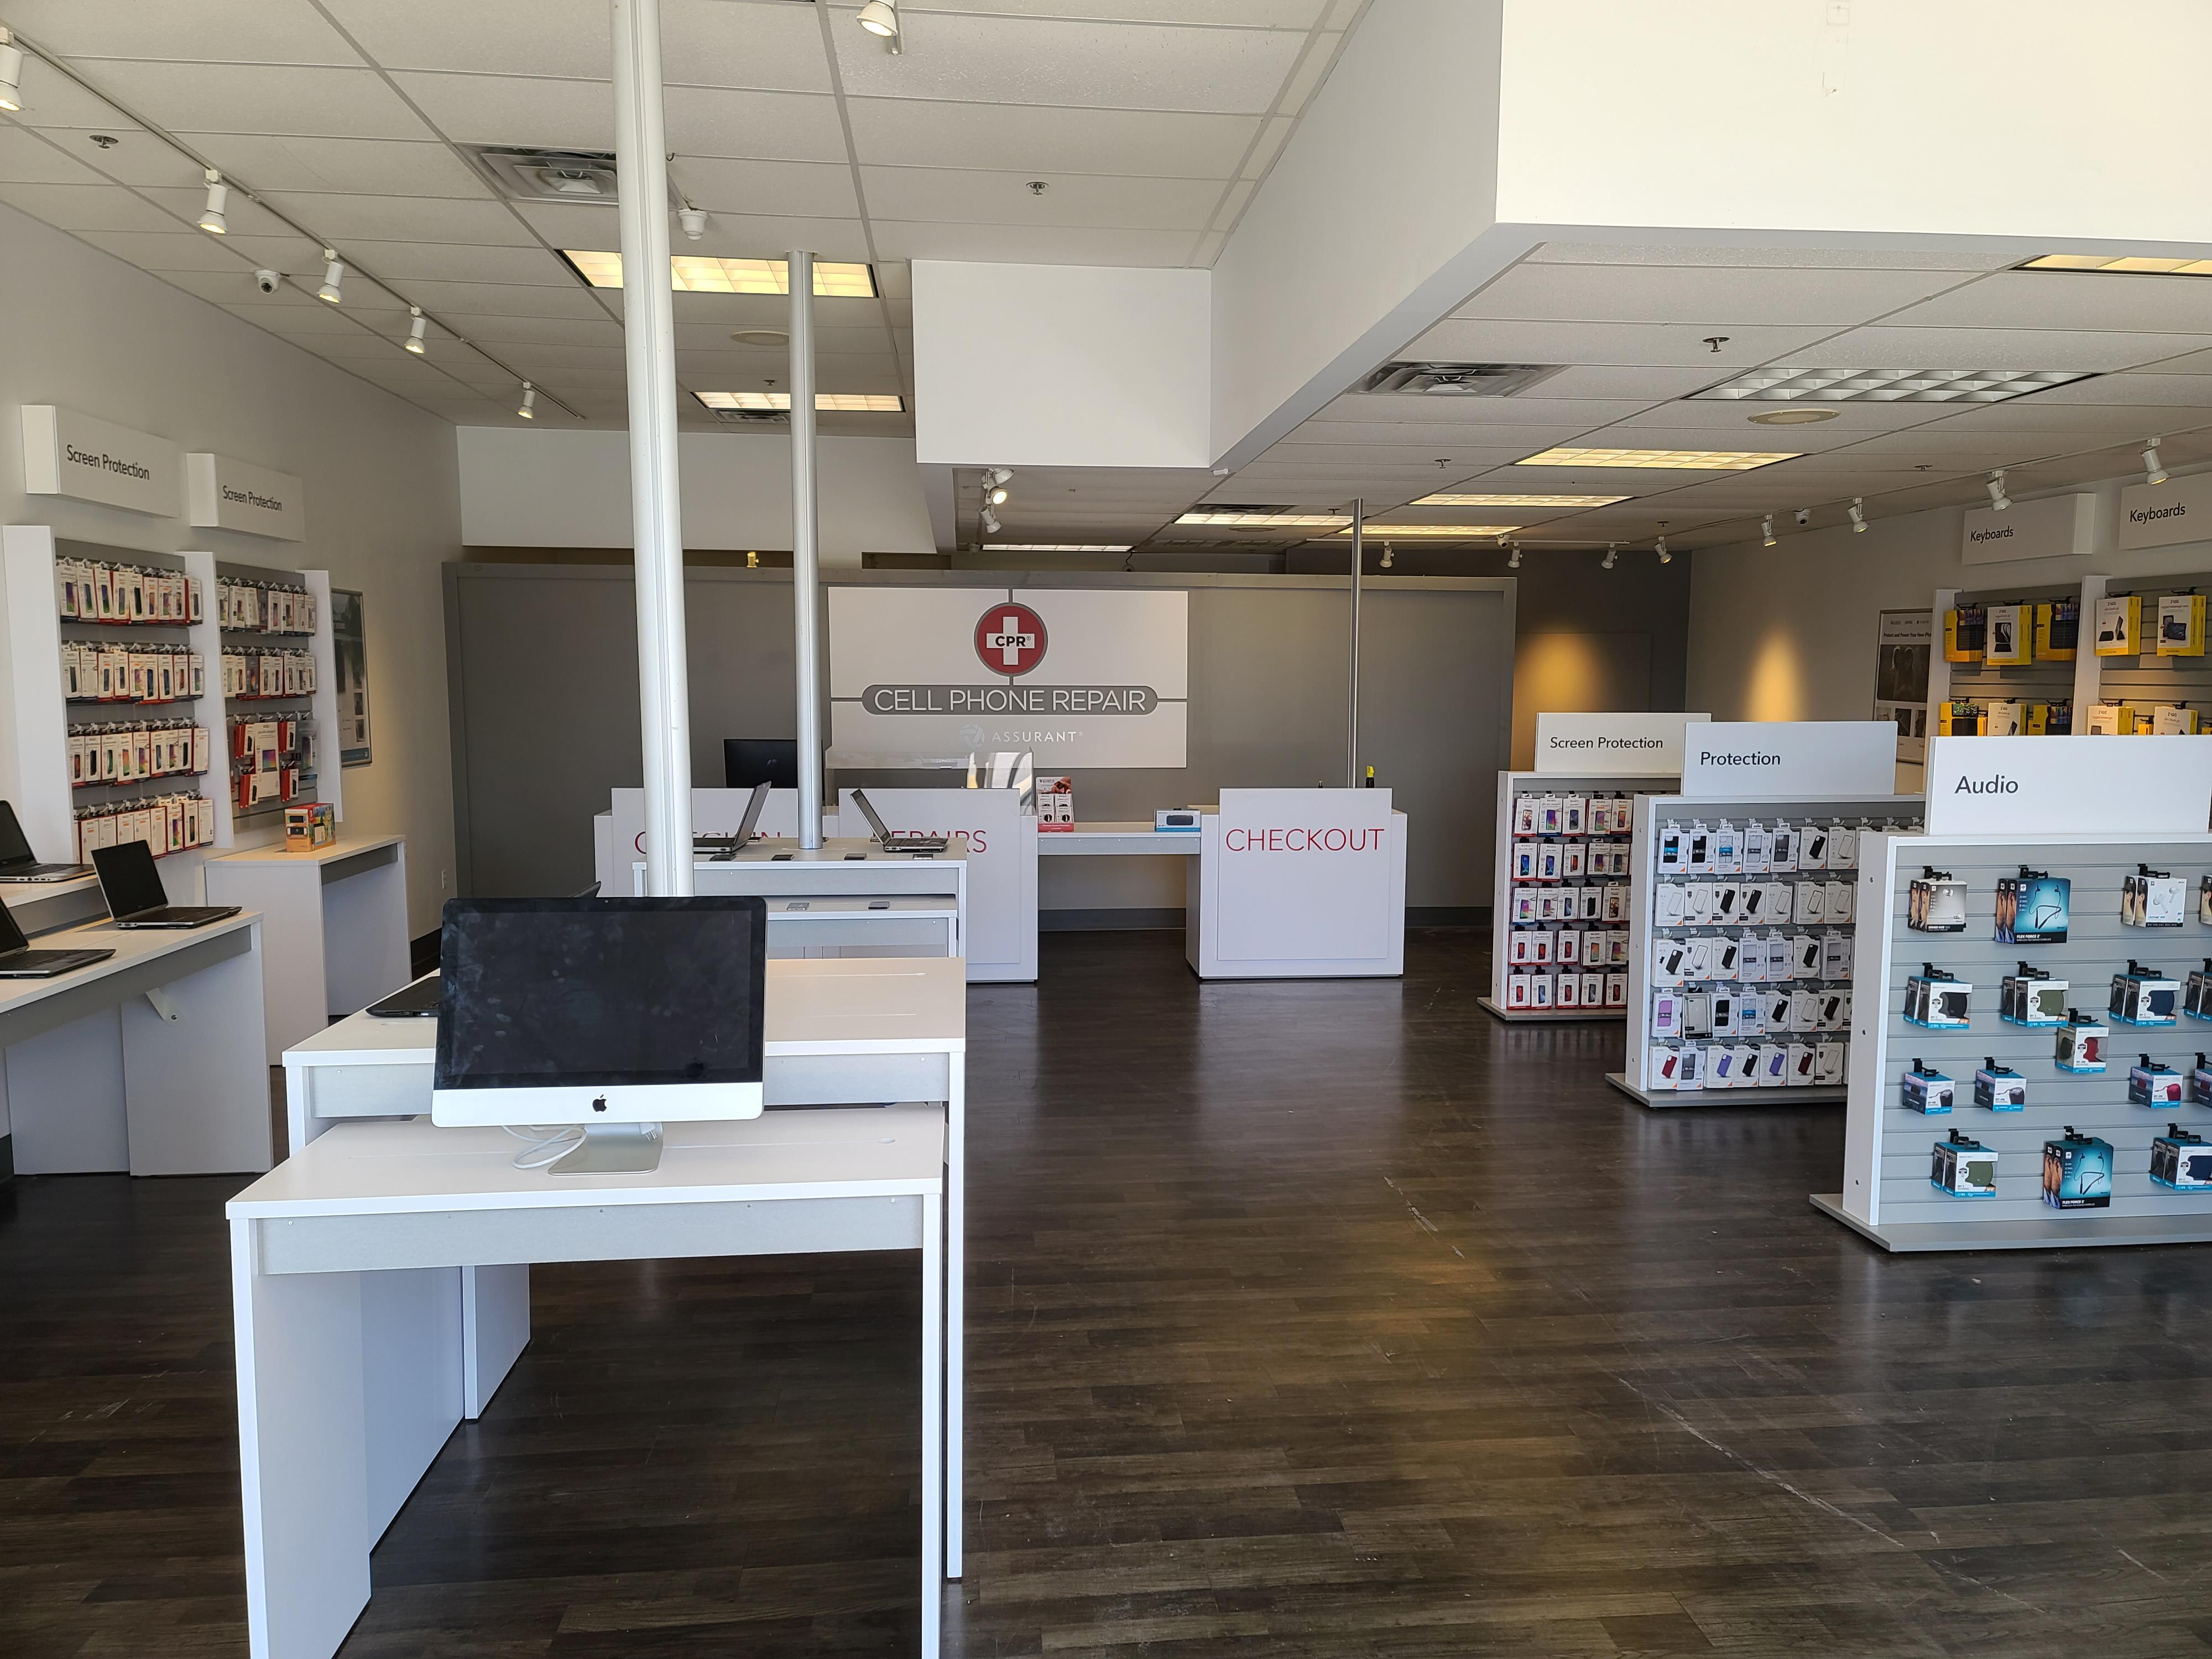 CPR Cell Phone Repair San Antonio - Southwest